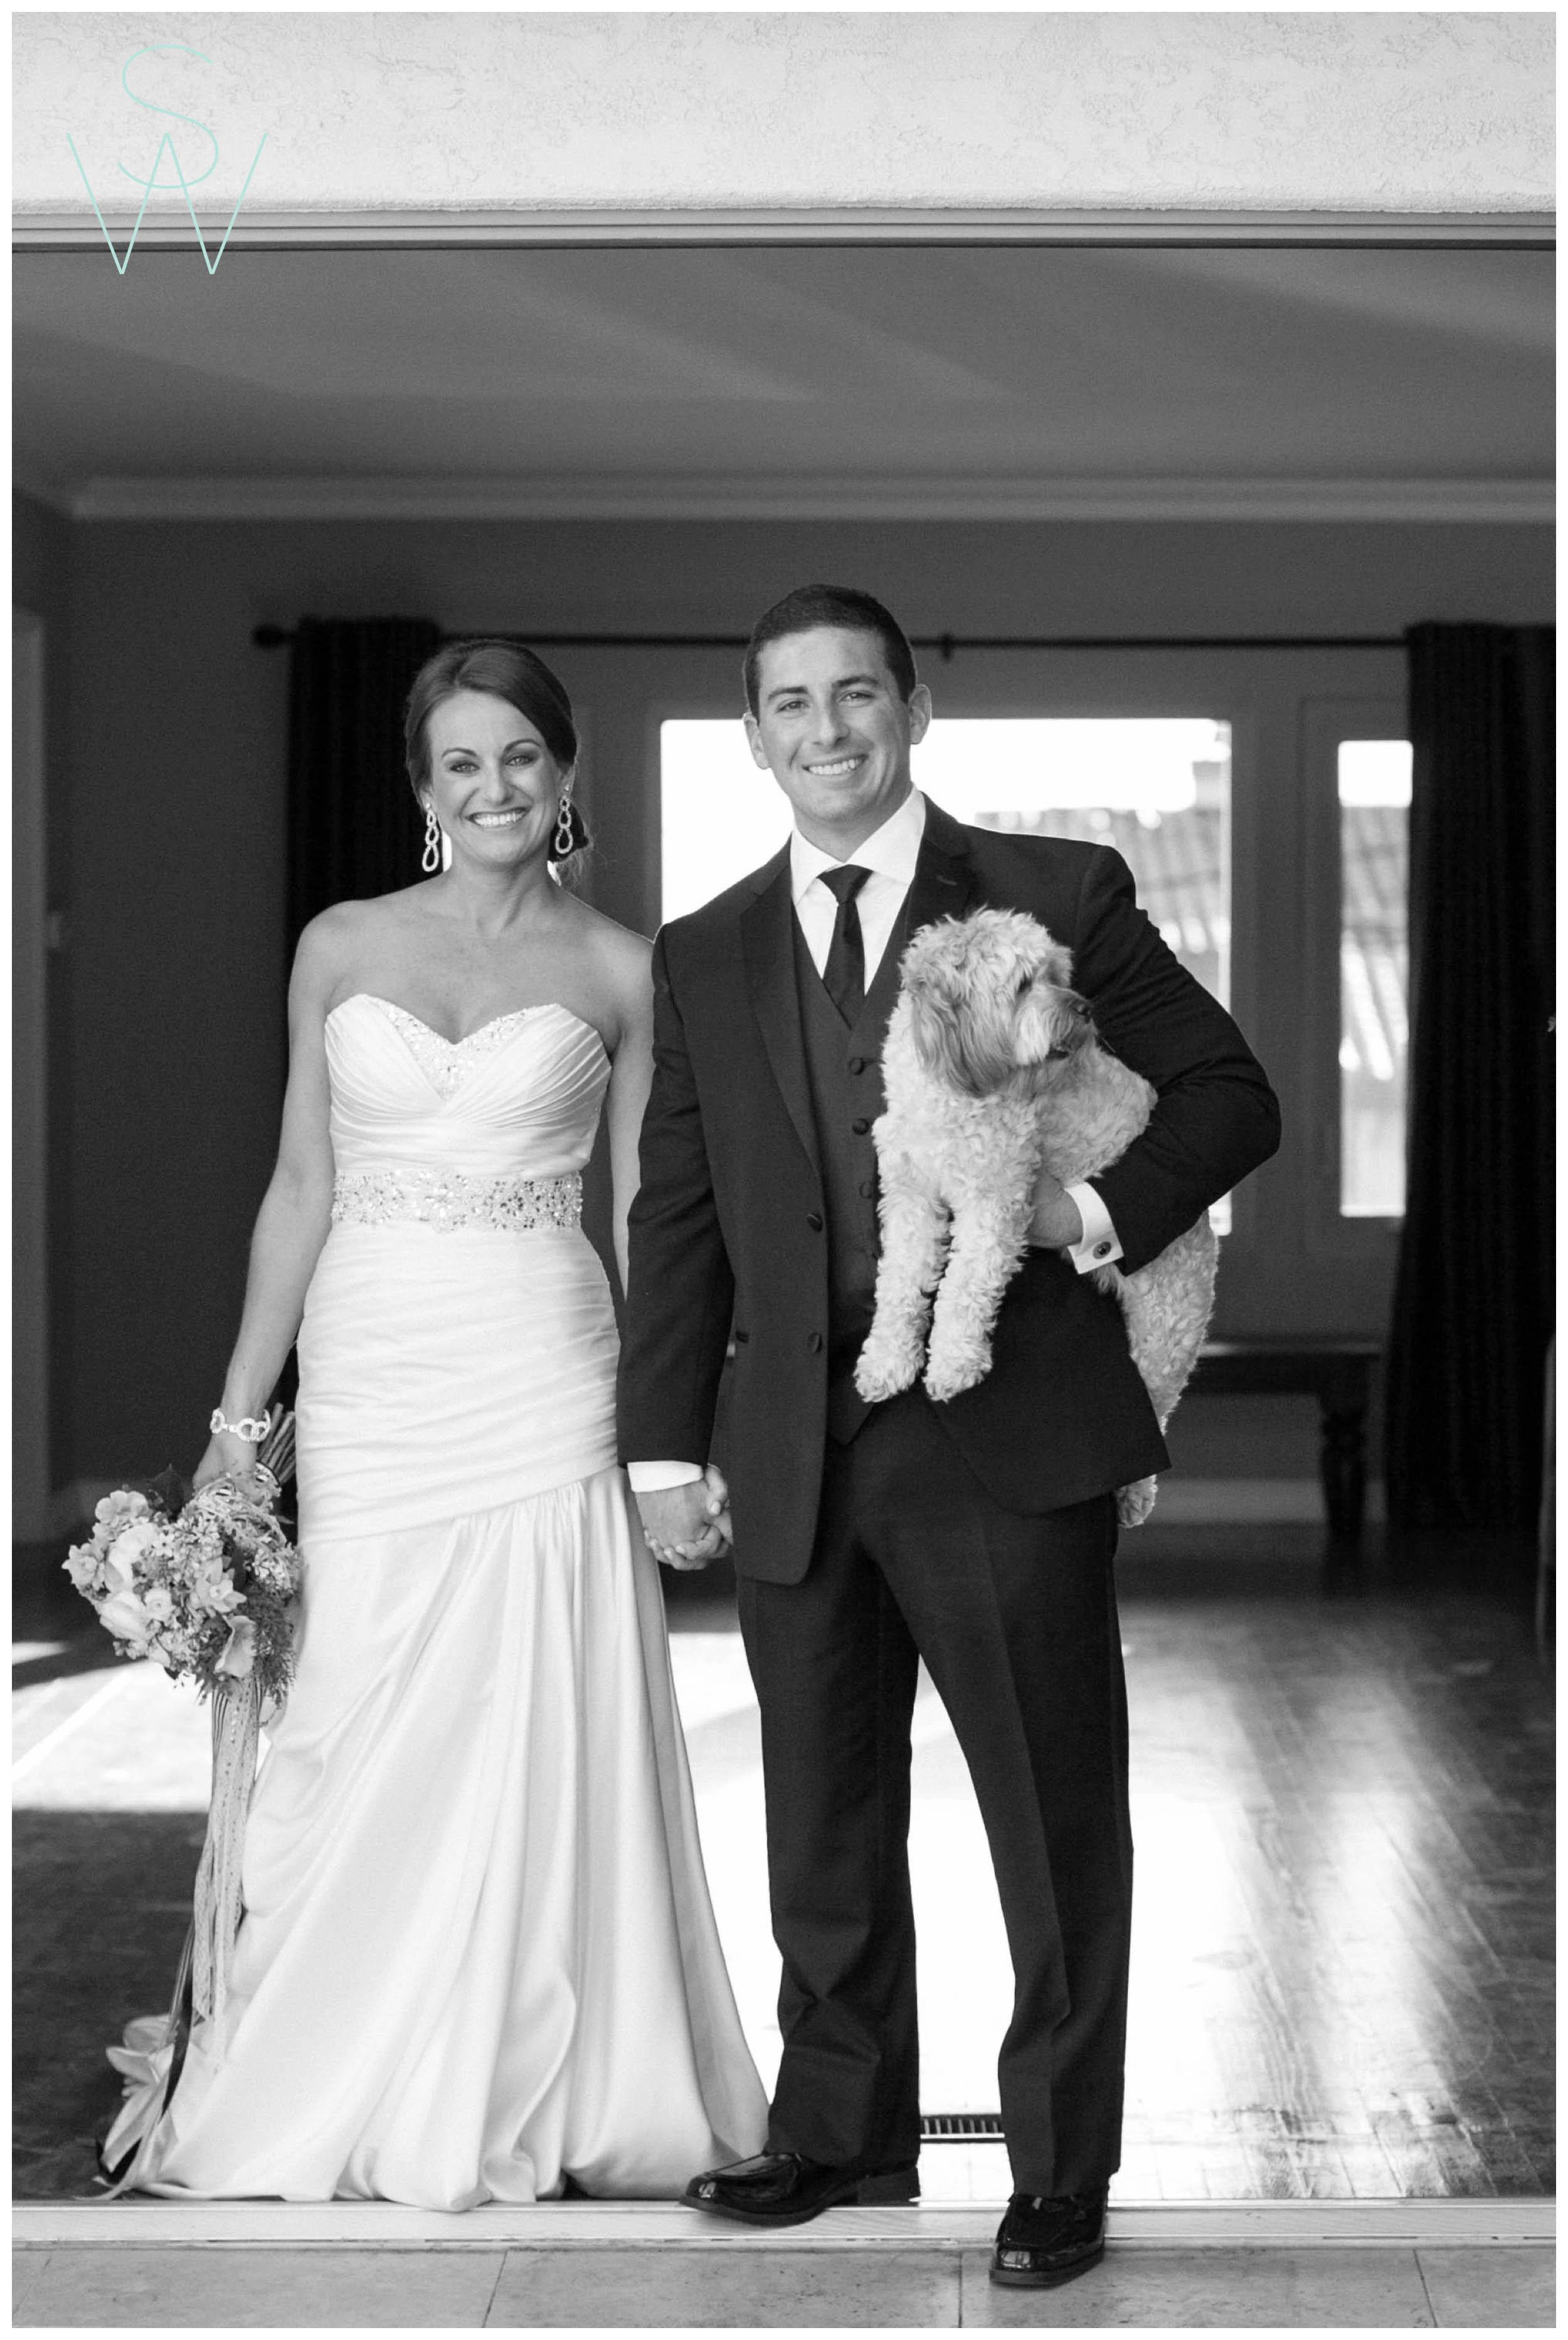 Shewanders.sdma_.wedding.photography-1021.jpg.wedding.photography-1021.jpg